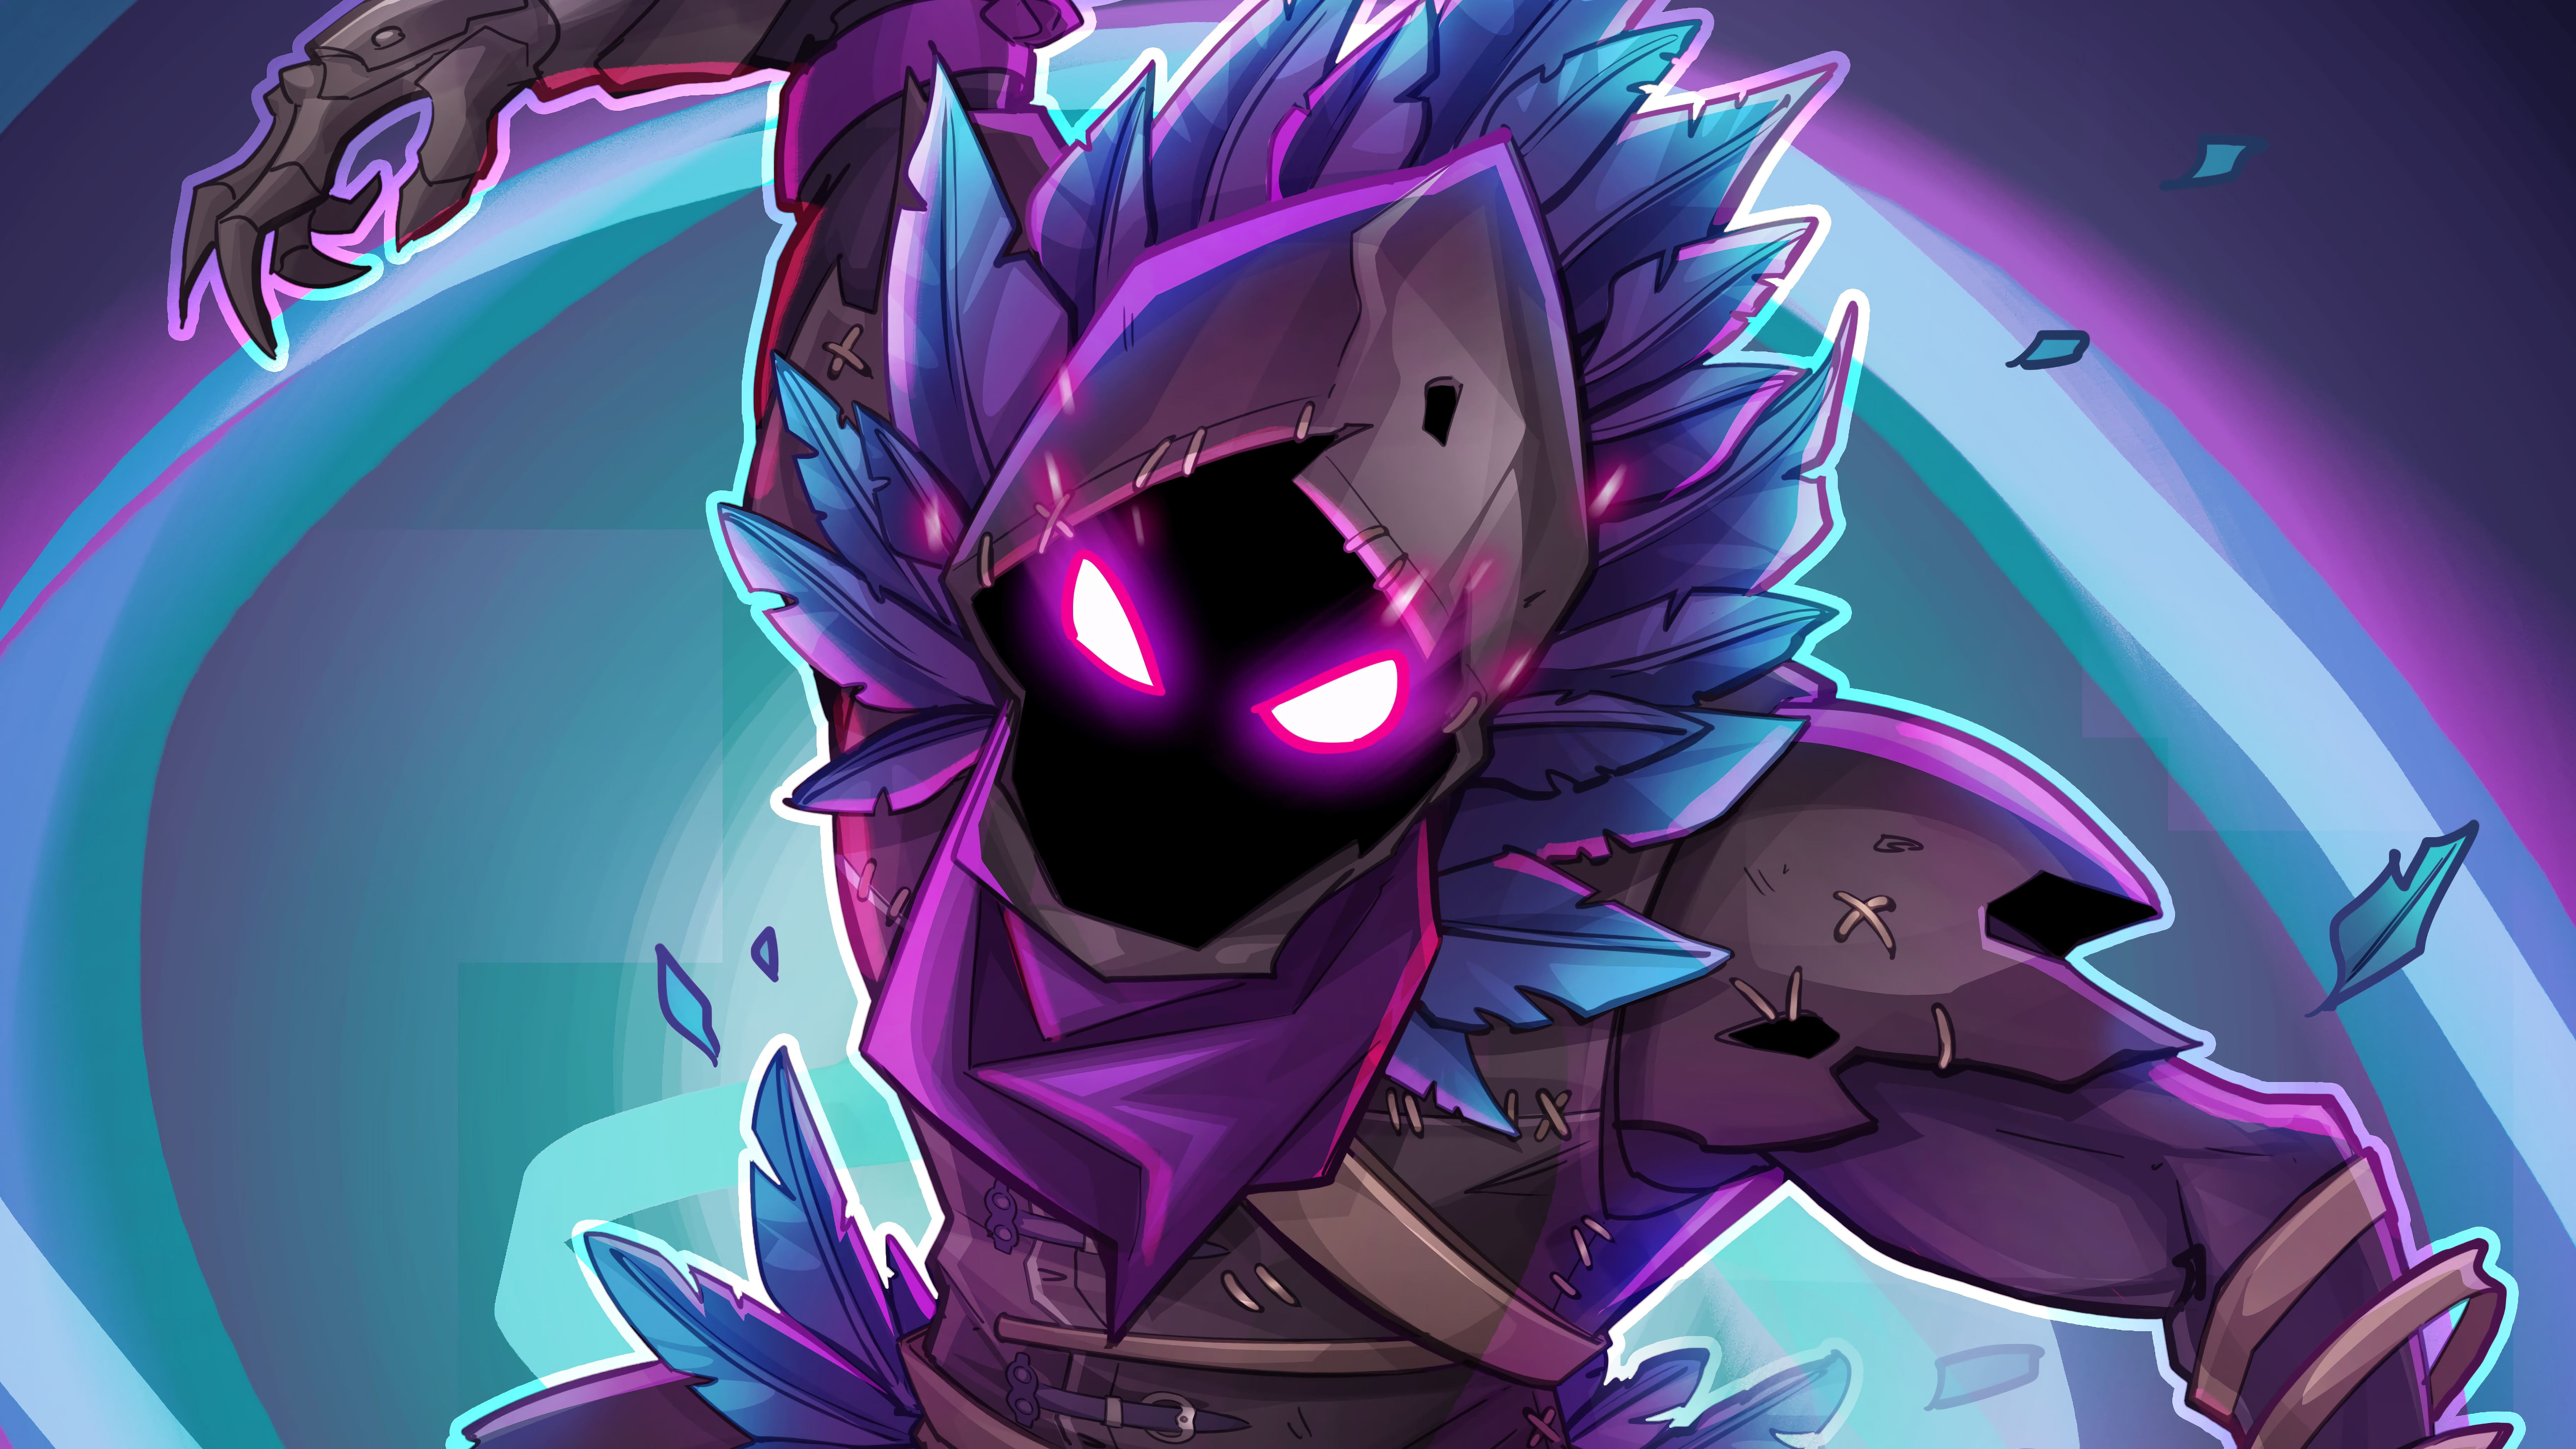 Fondos de pantalla Fortnite Raven